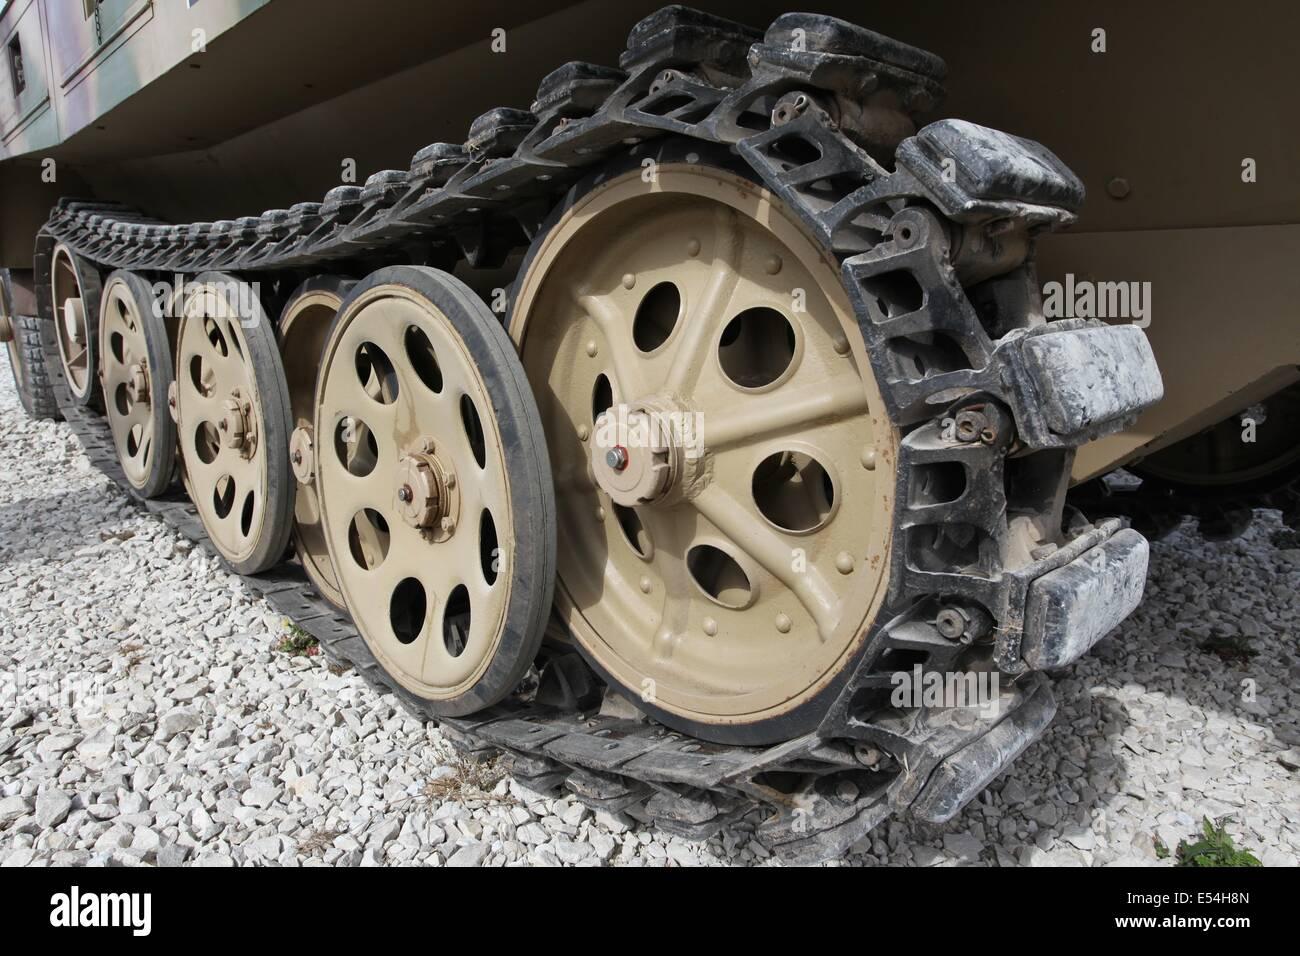 German Sd.Kfz. 250 half track - Bovington Stock Photo